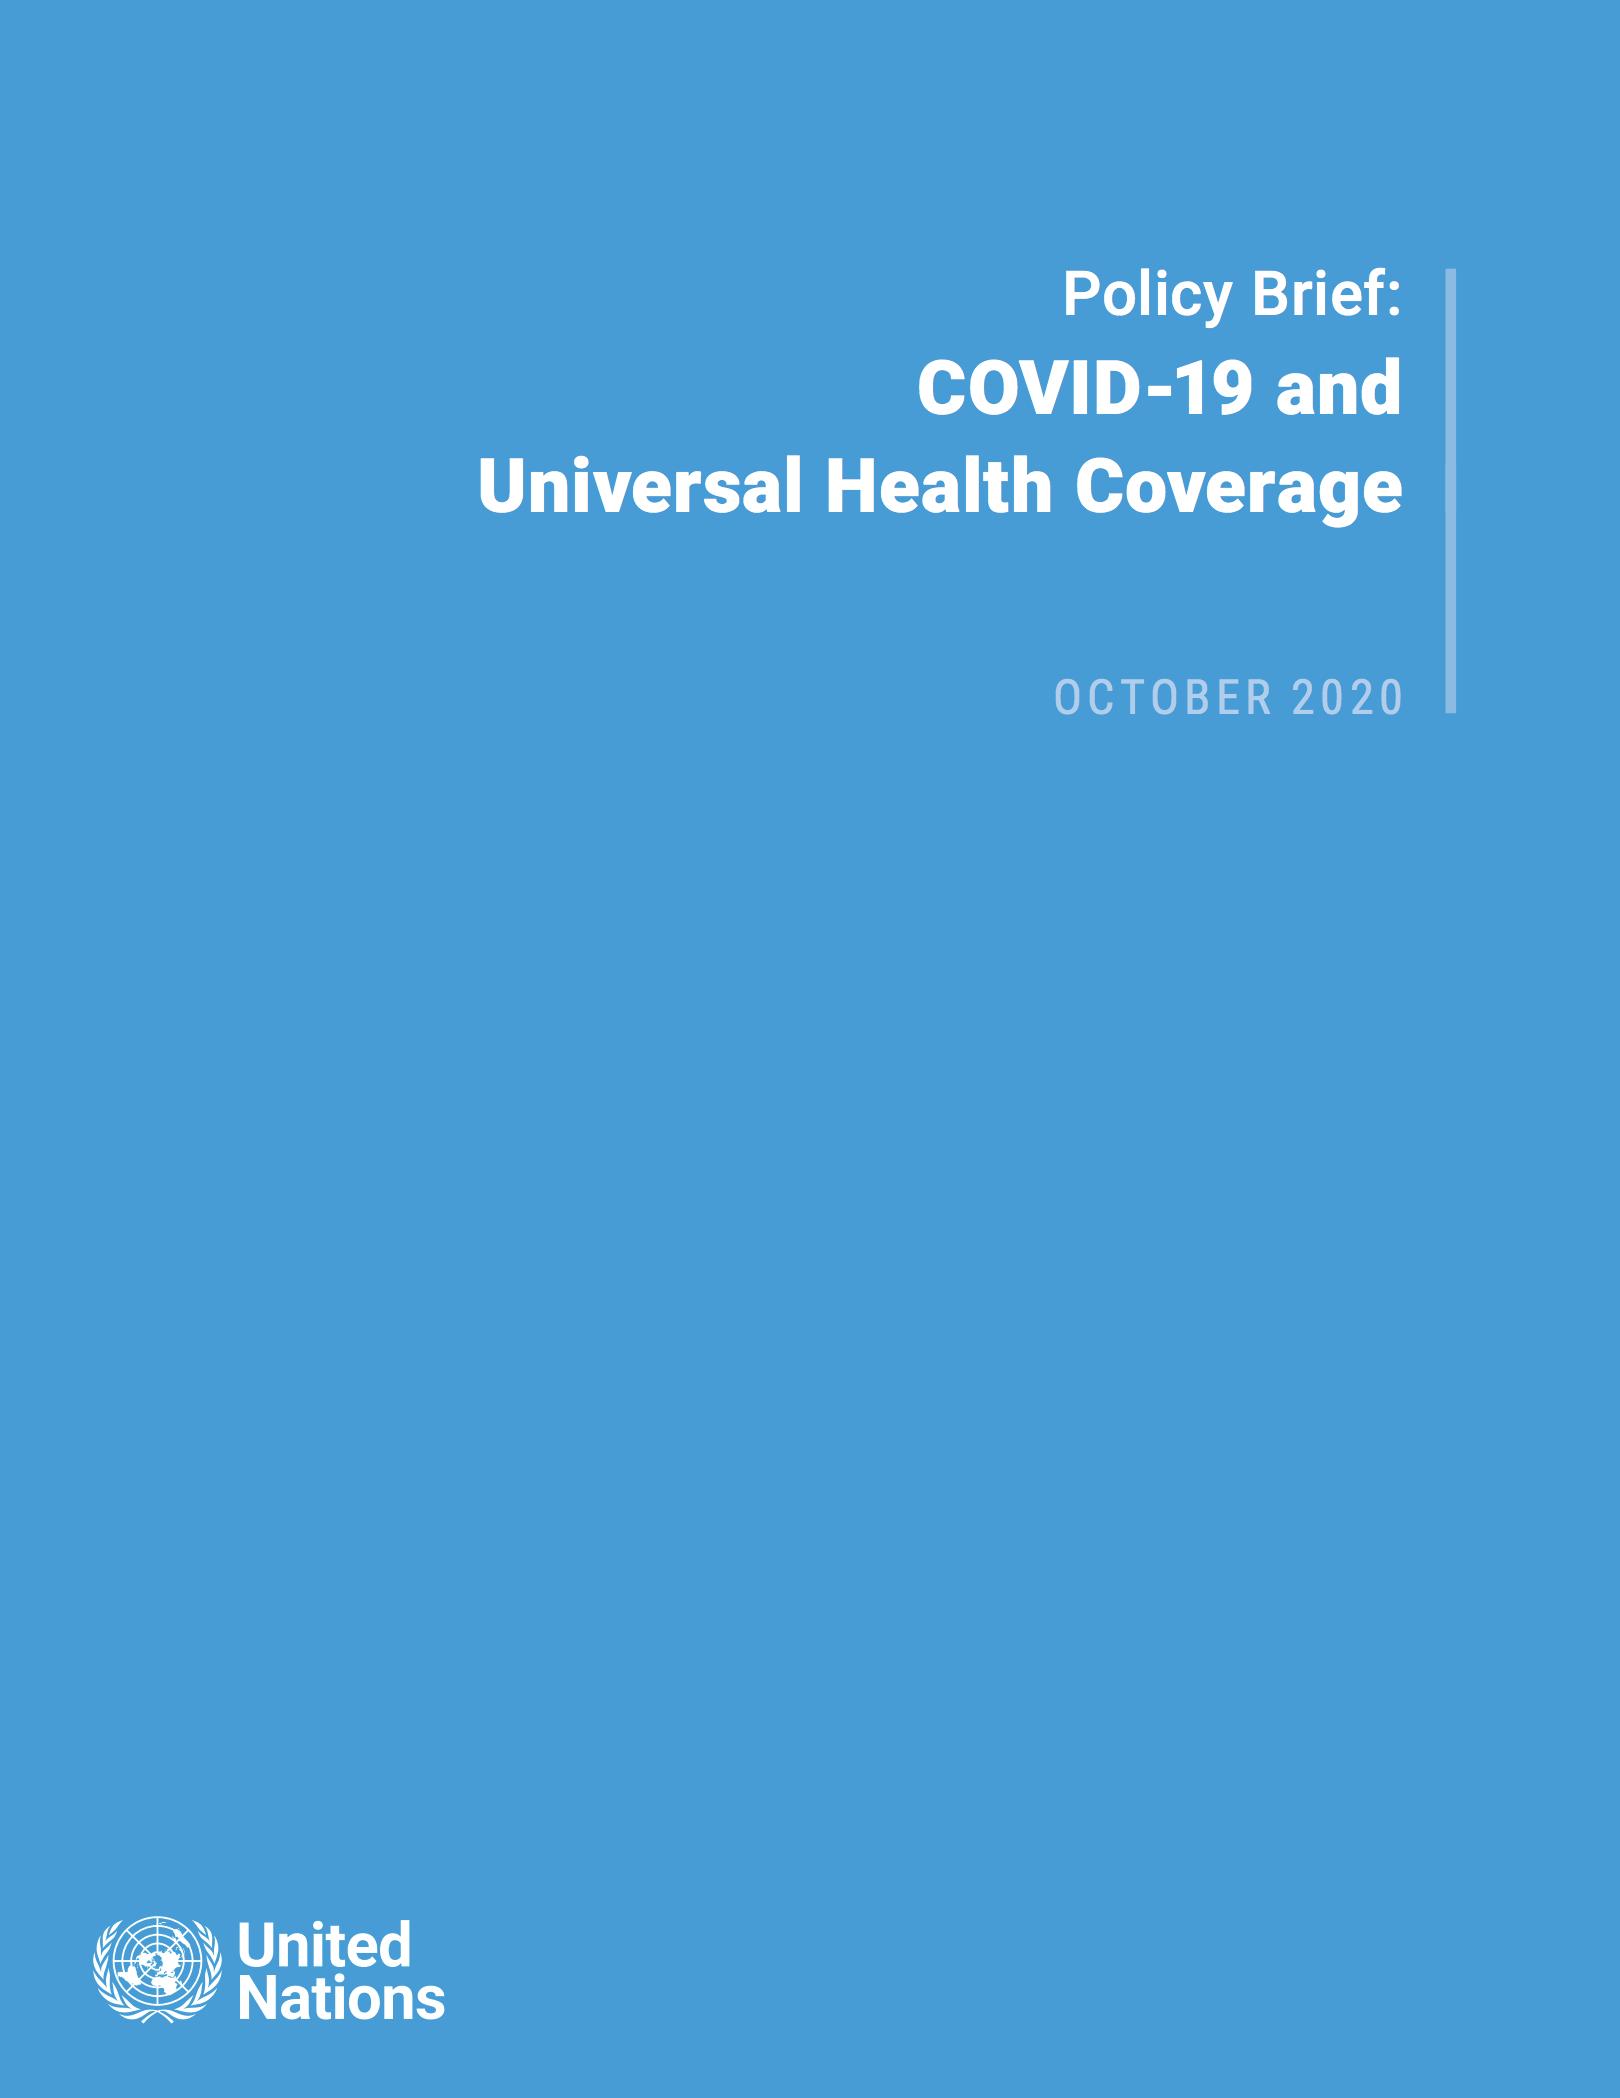 COVID-19 and Universal Health Coverage